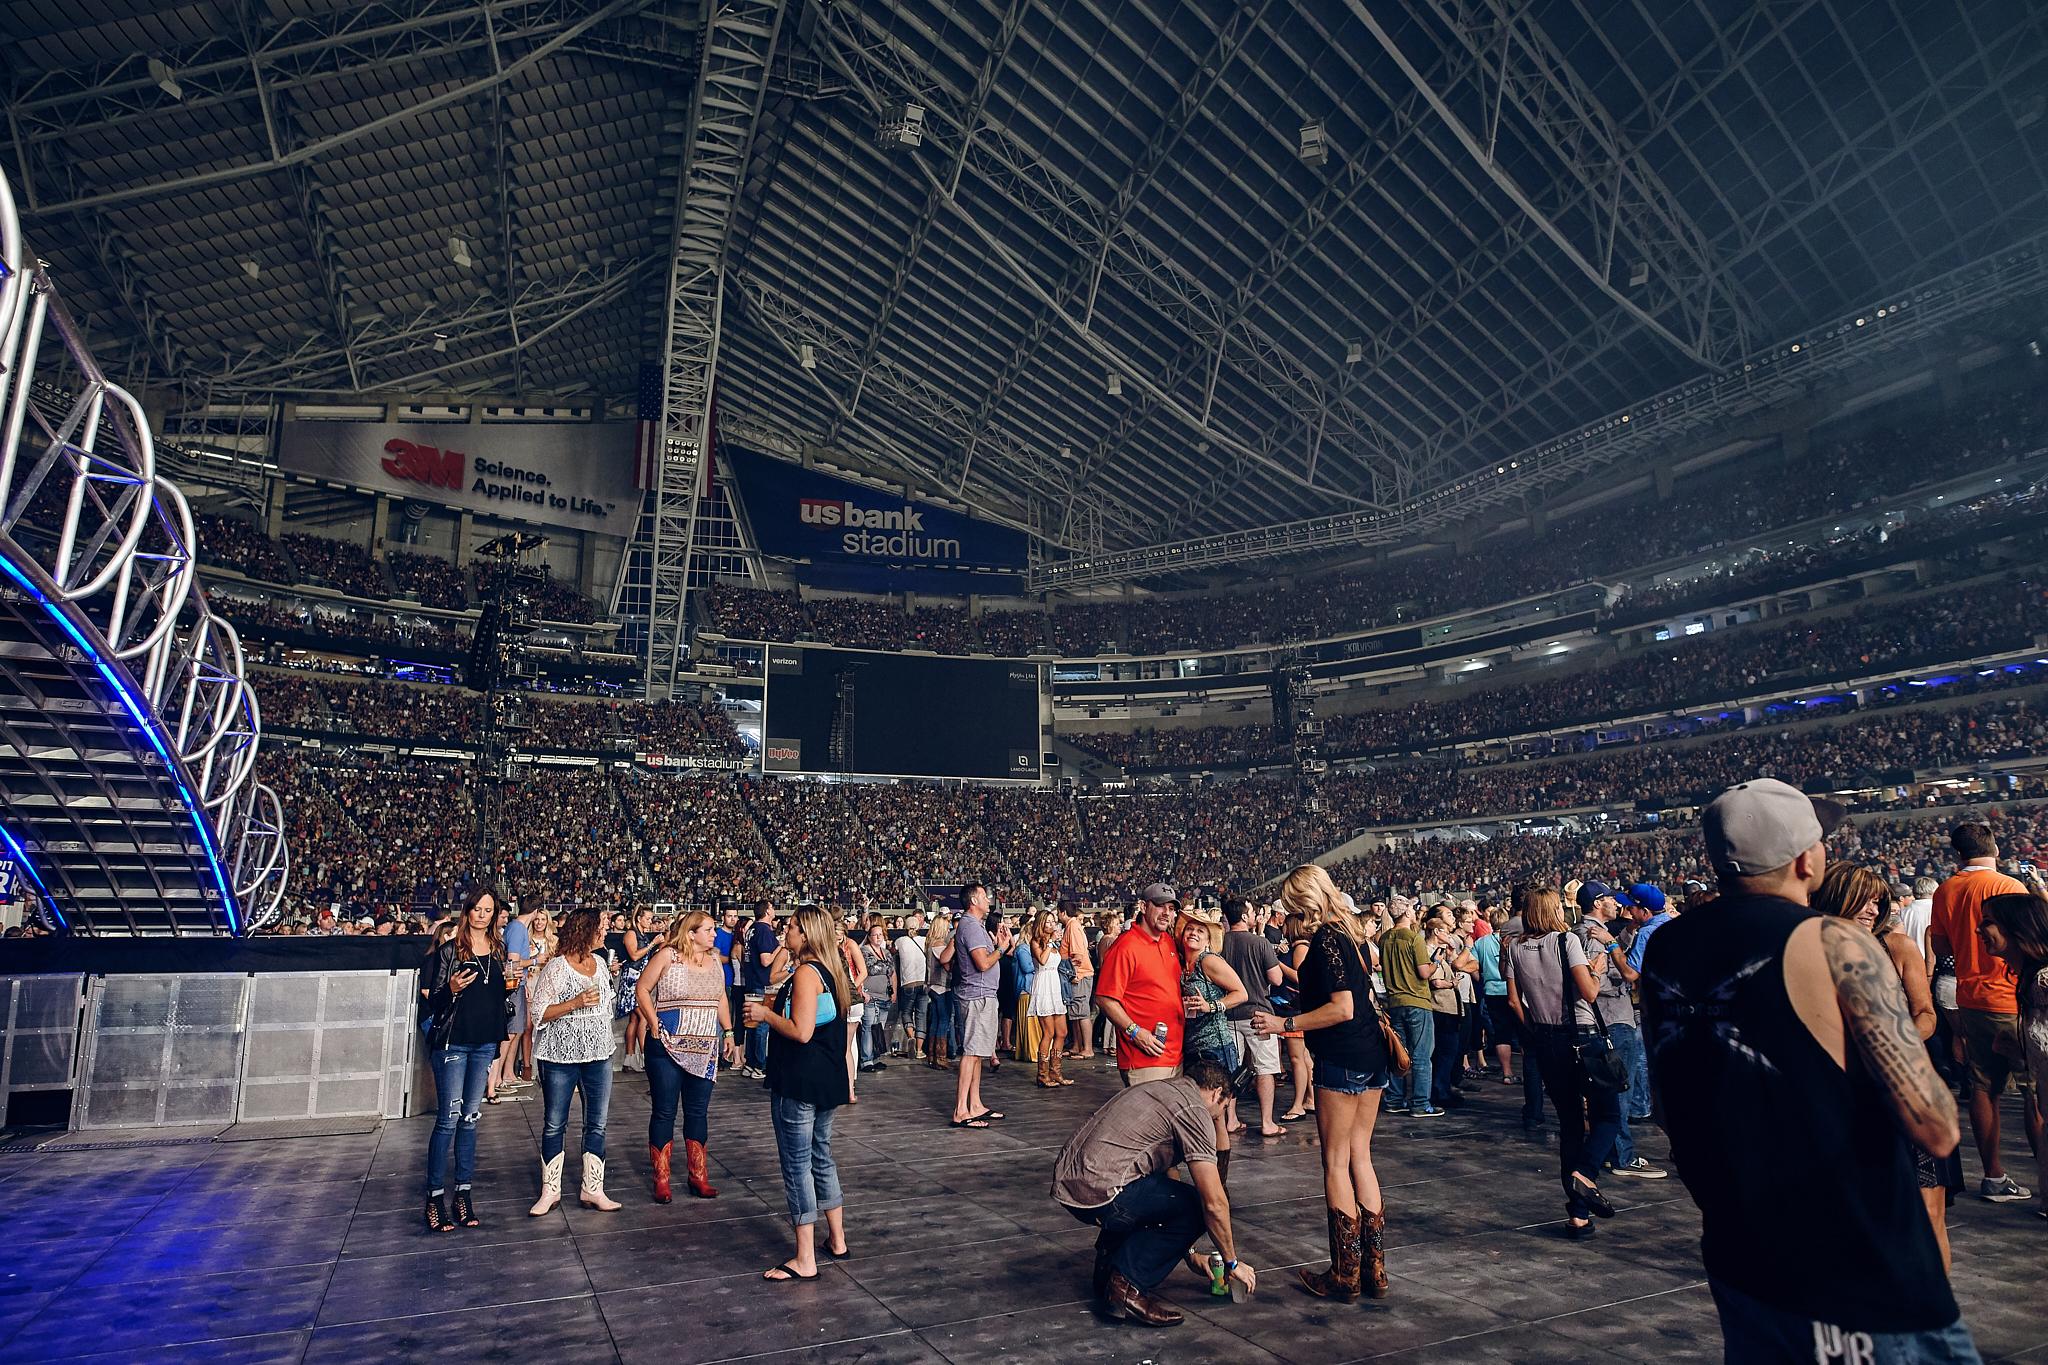 First_Concert_Luke_Bryan_US_Bank_Stadium_Minneapolis_Minnesota_Photography_By_Joe_Lemke_011.JPG